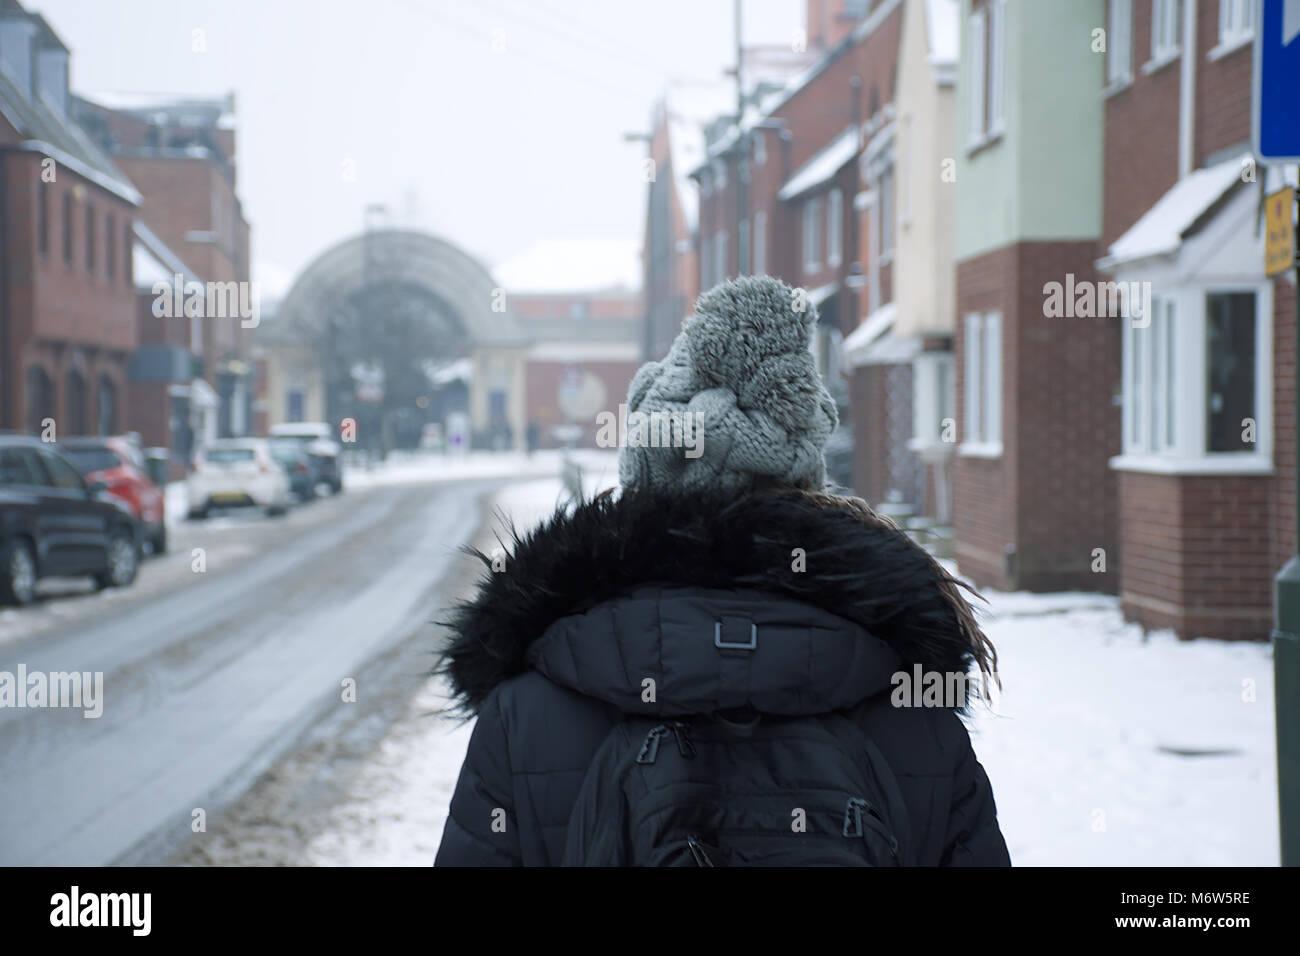 Con Una Mujer NegroLa Vestida Mochila De Ropa Invierno BhrdCtxsQ